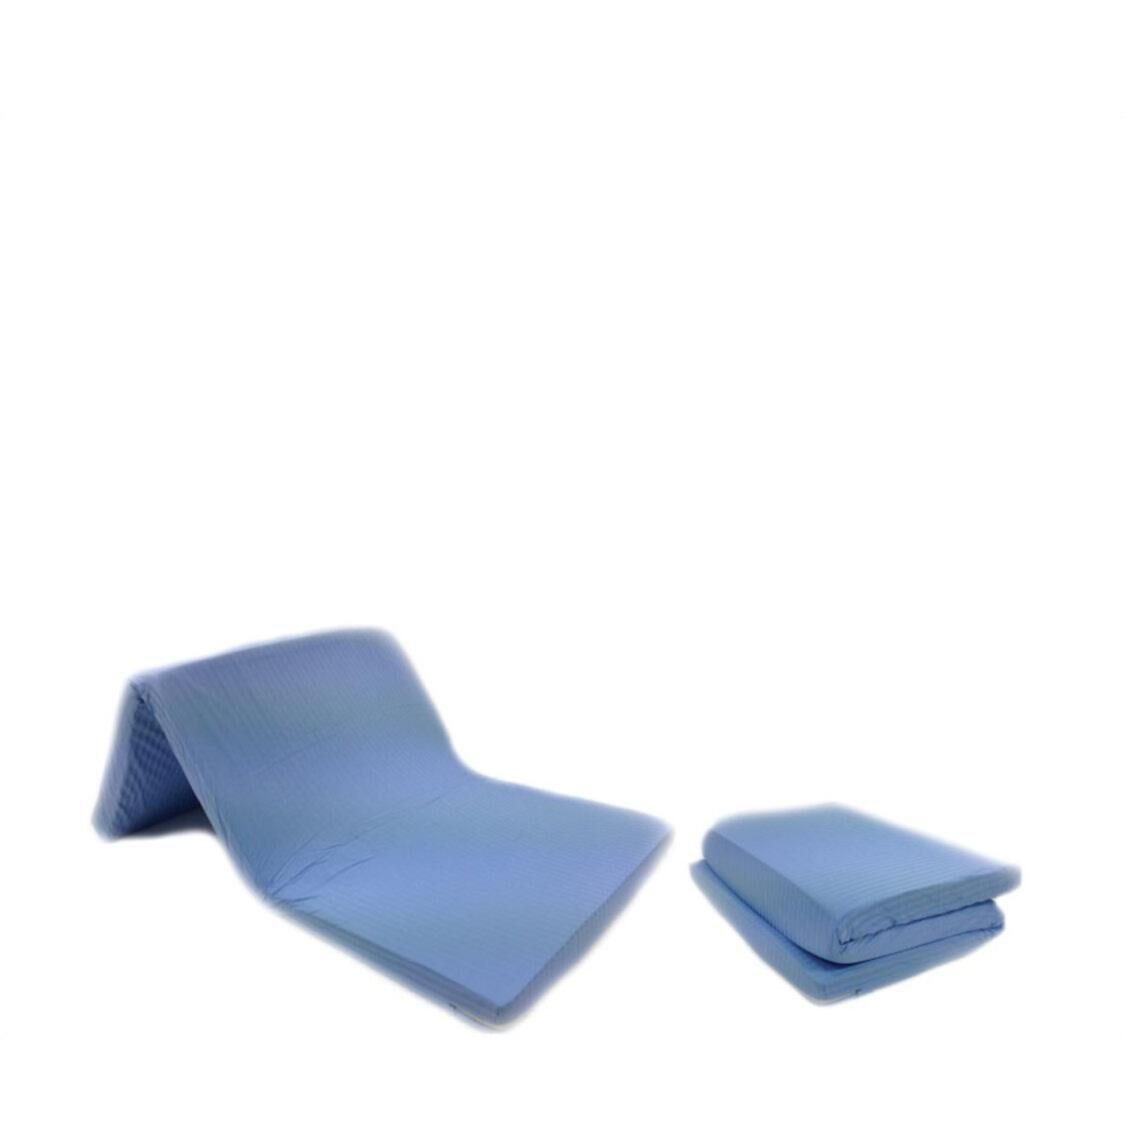 Crown 3 fold Orthopedic Foam Mattress